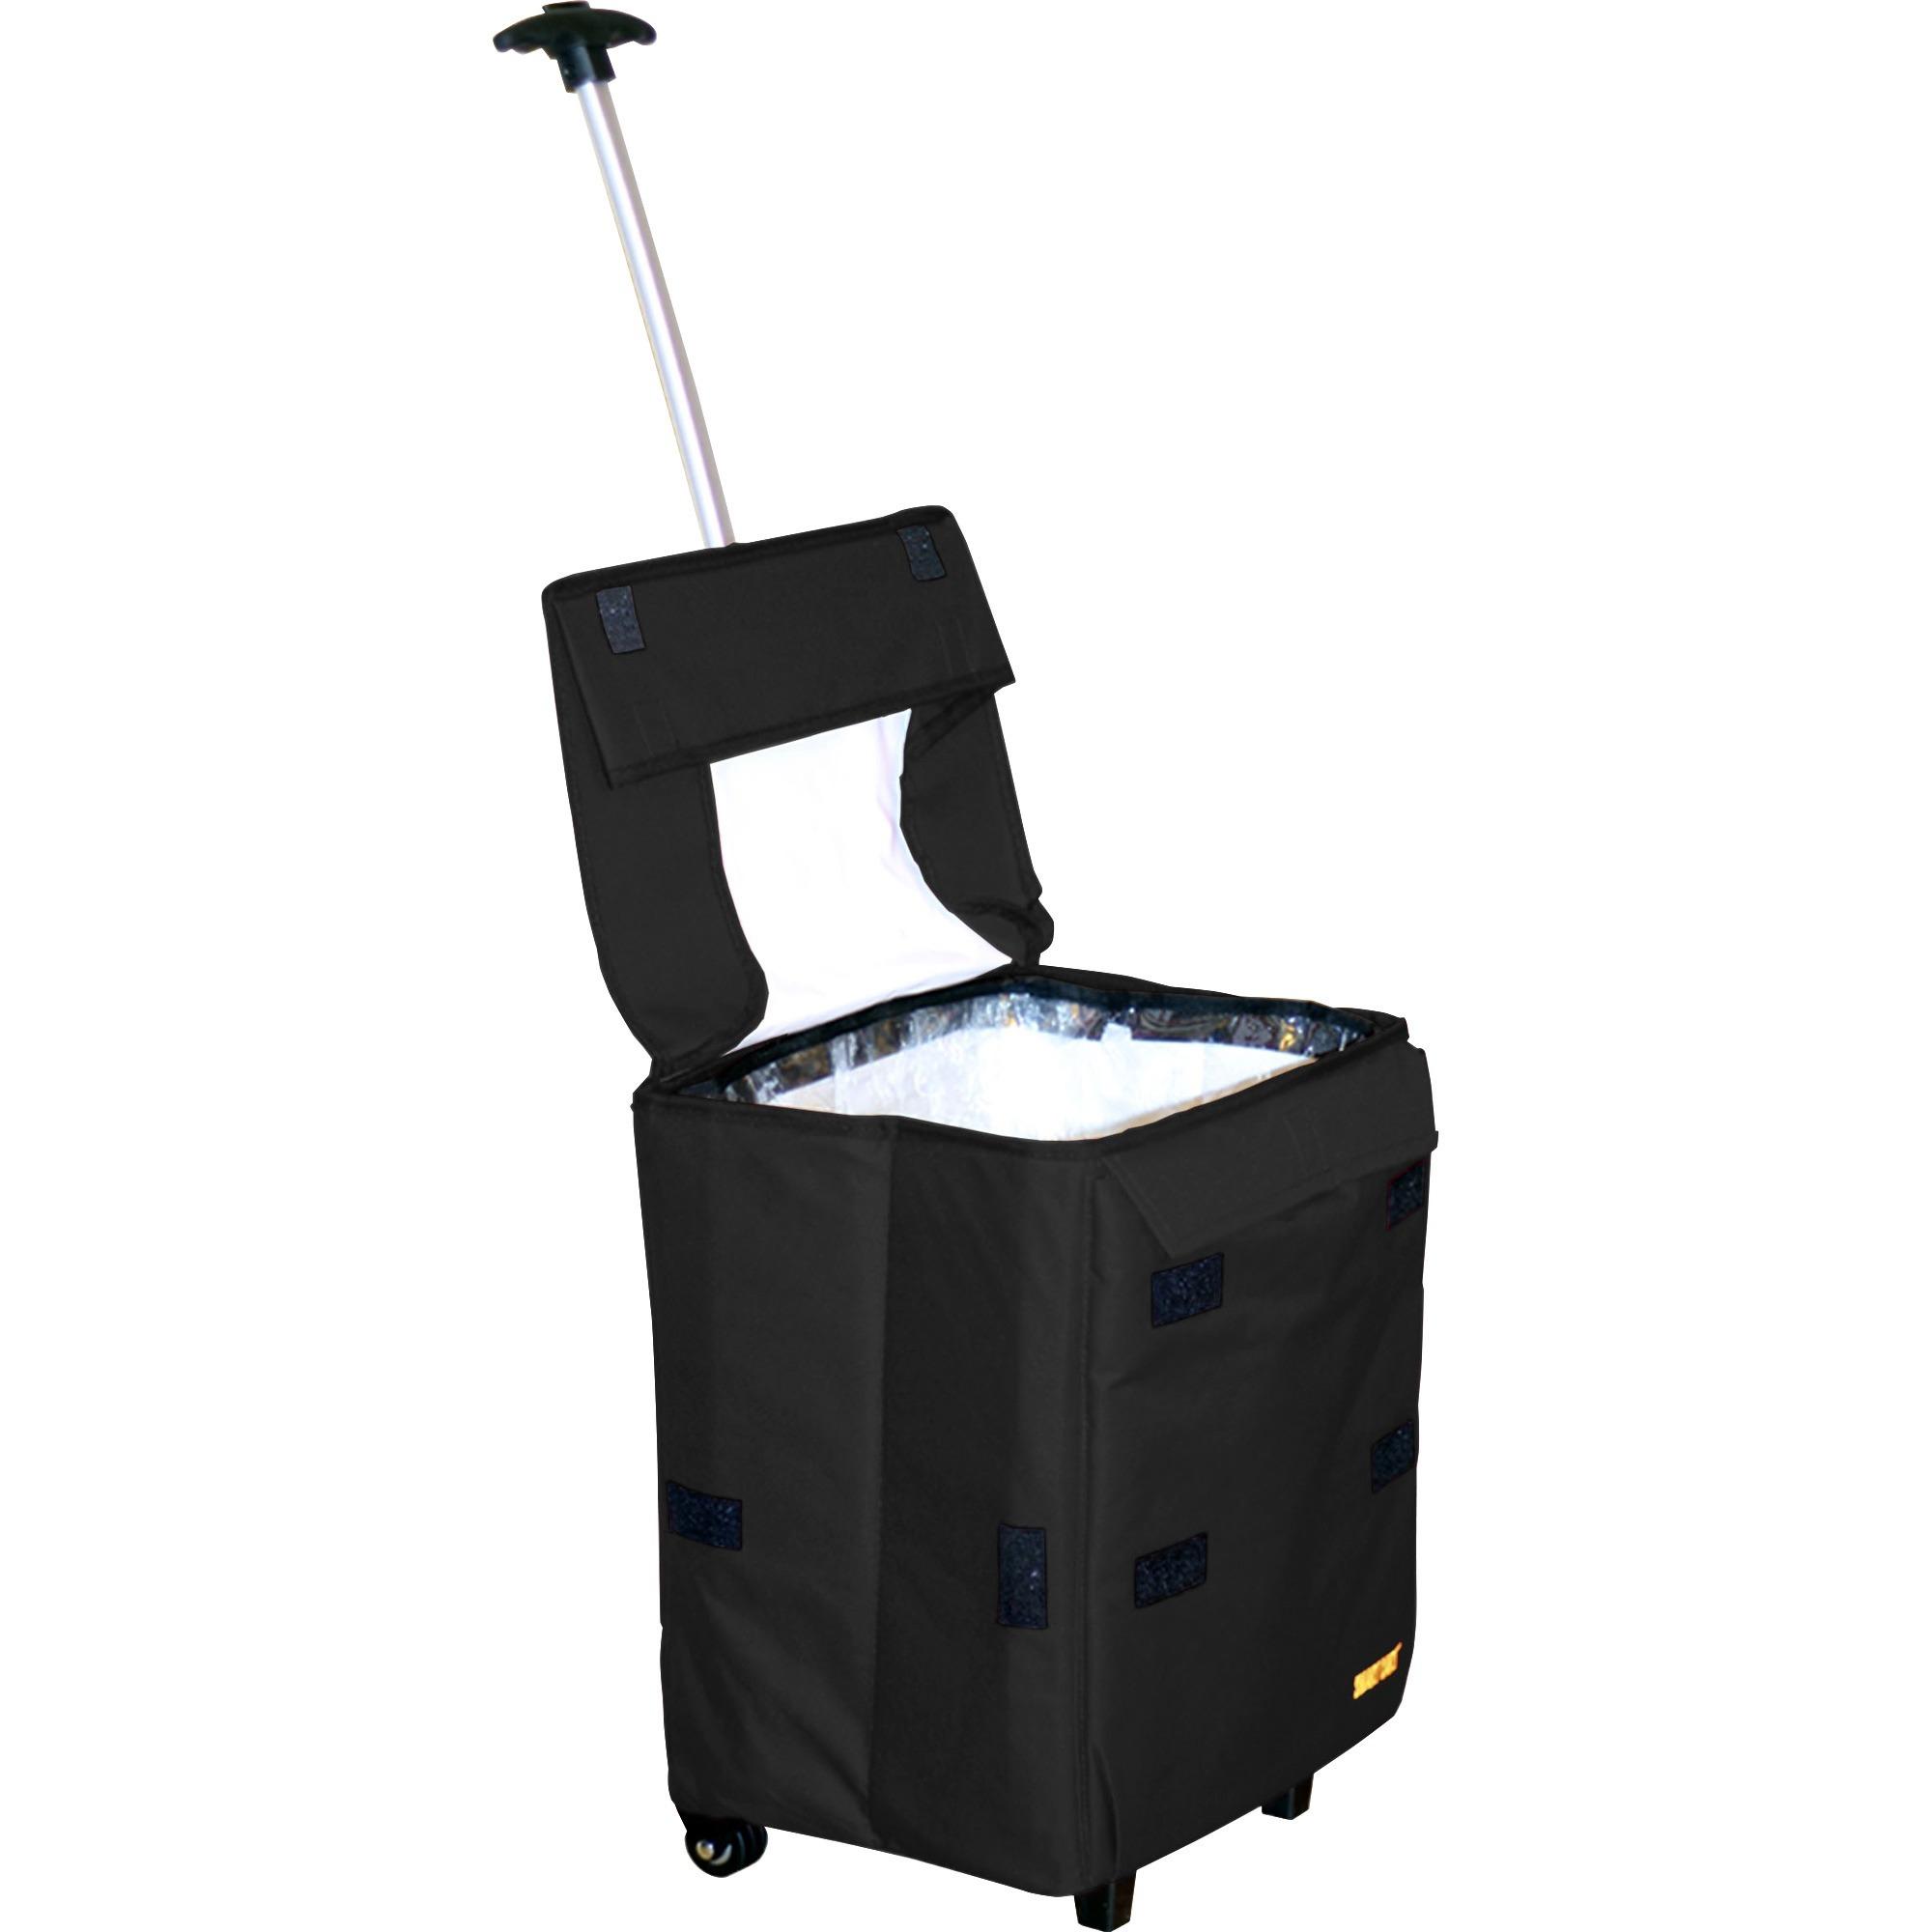 Dbest Smart Cart Cooler 29 06 Gal Black